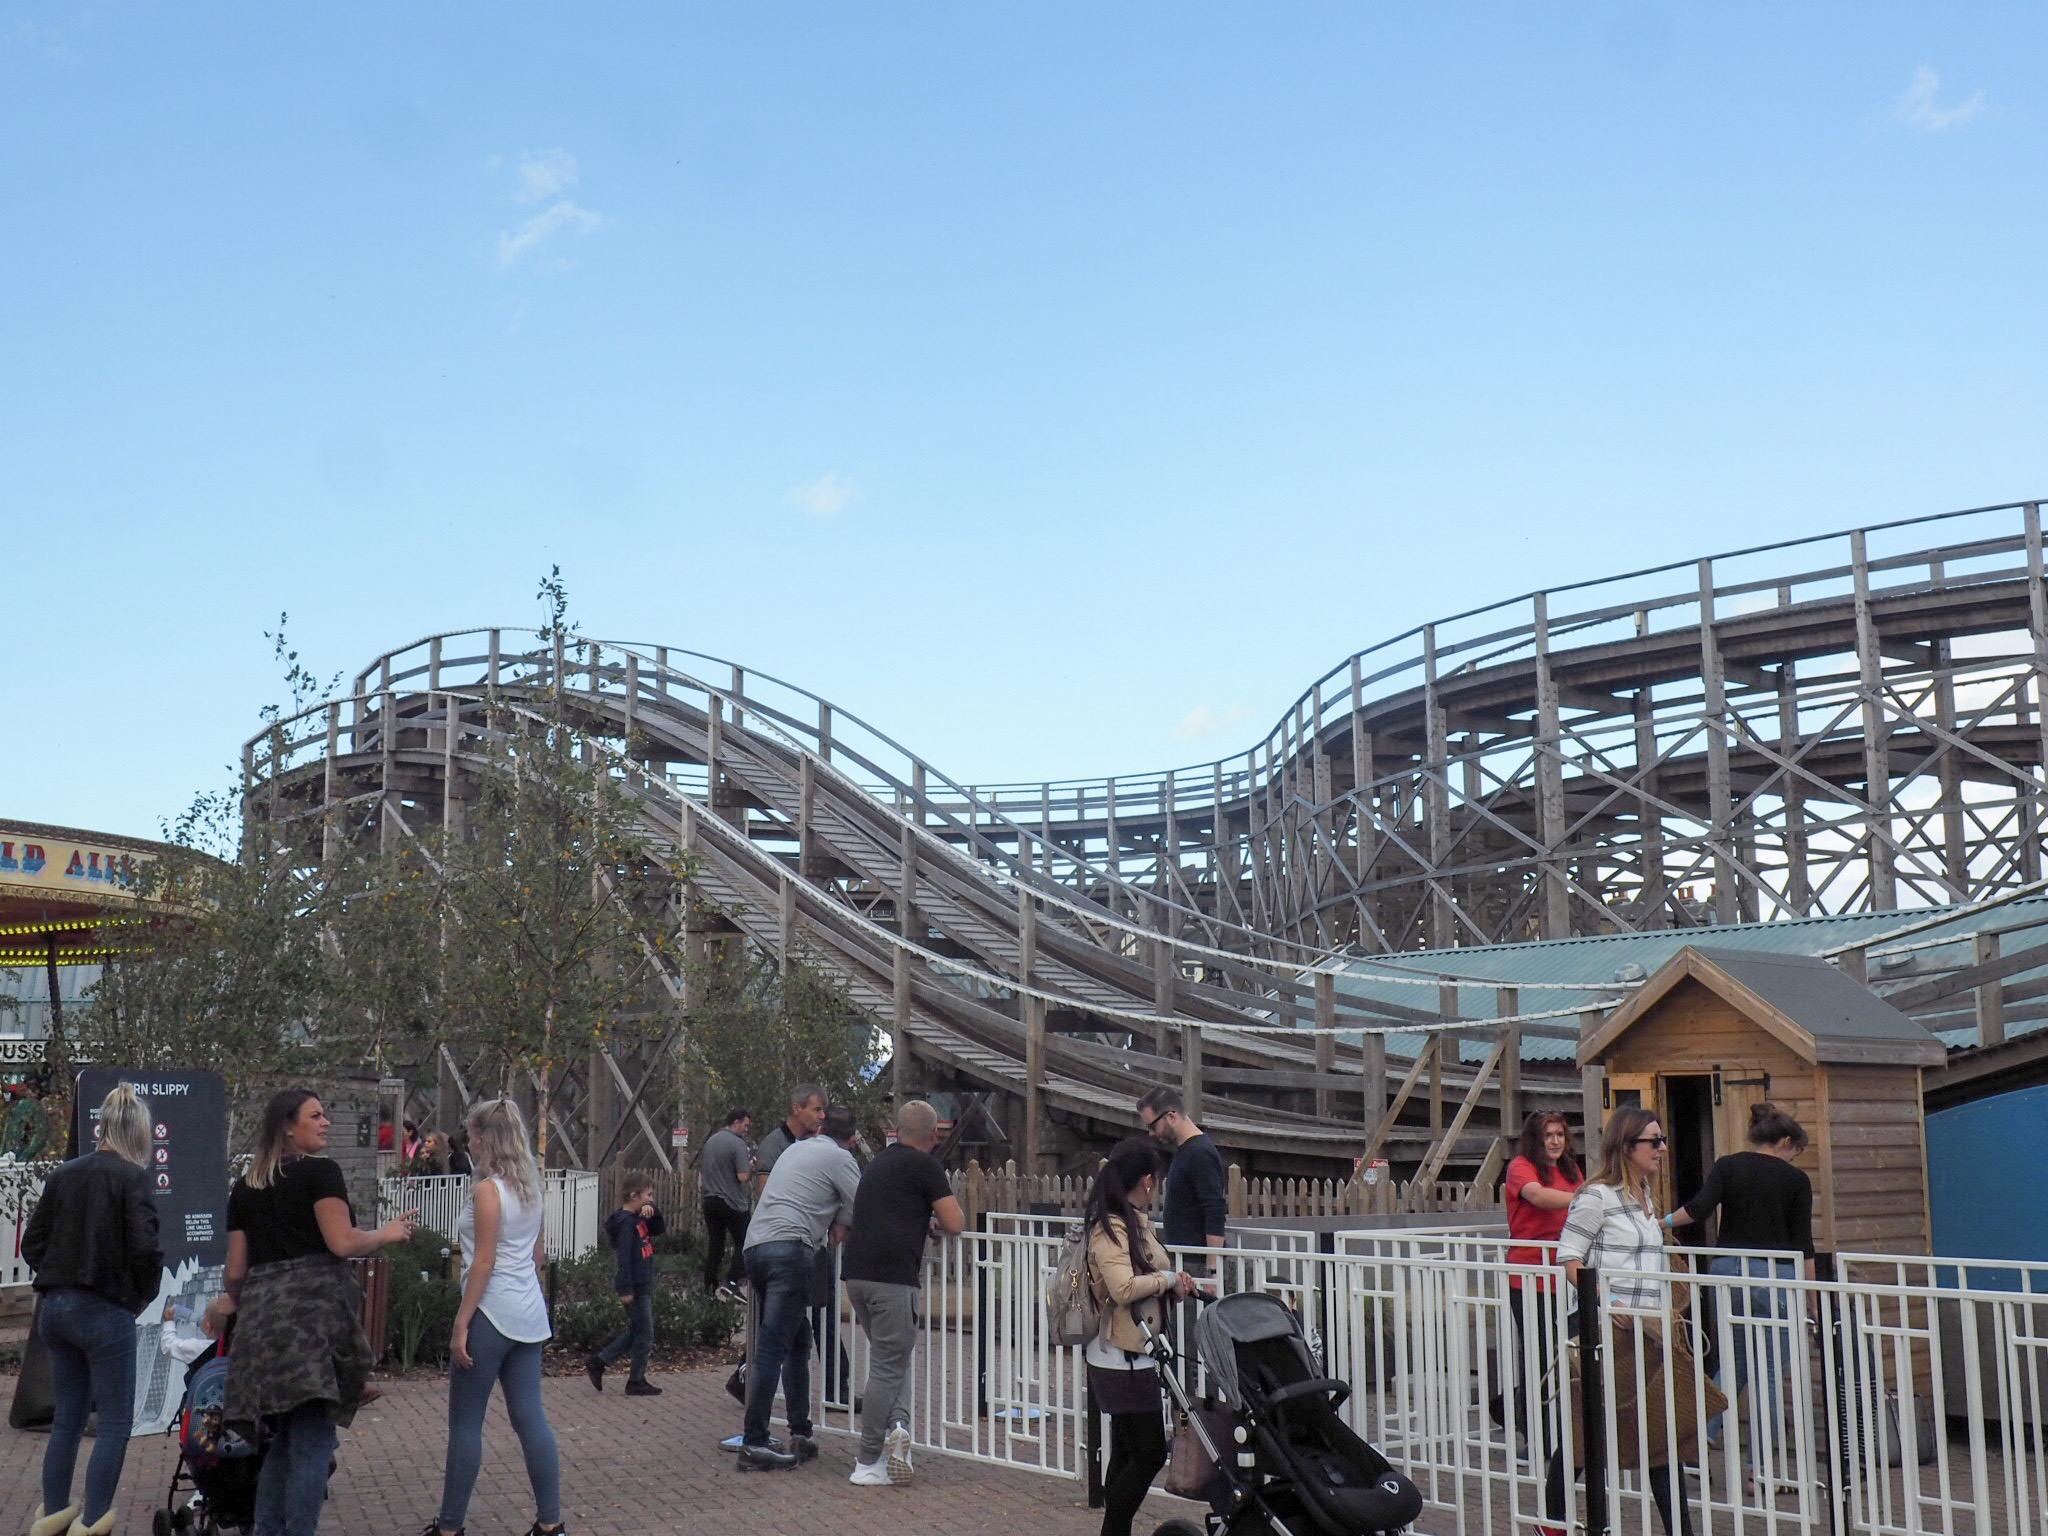 Wooden roller coaster at Margate